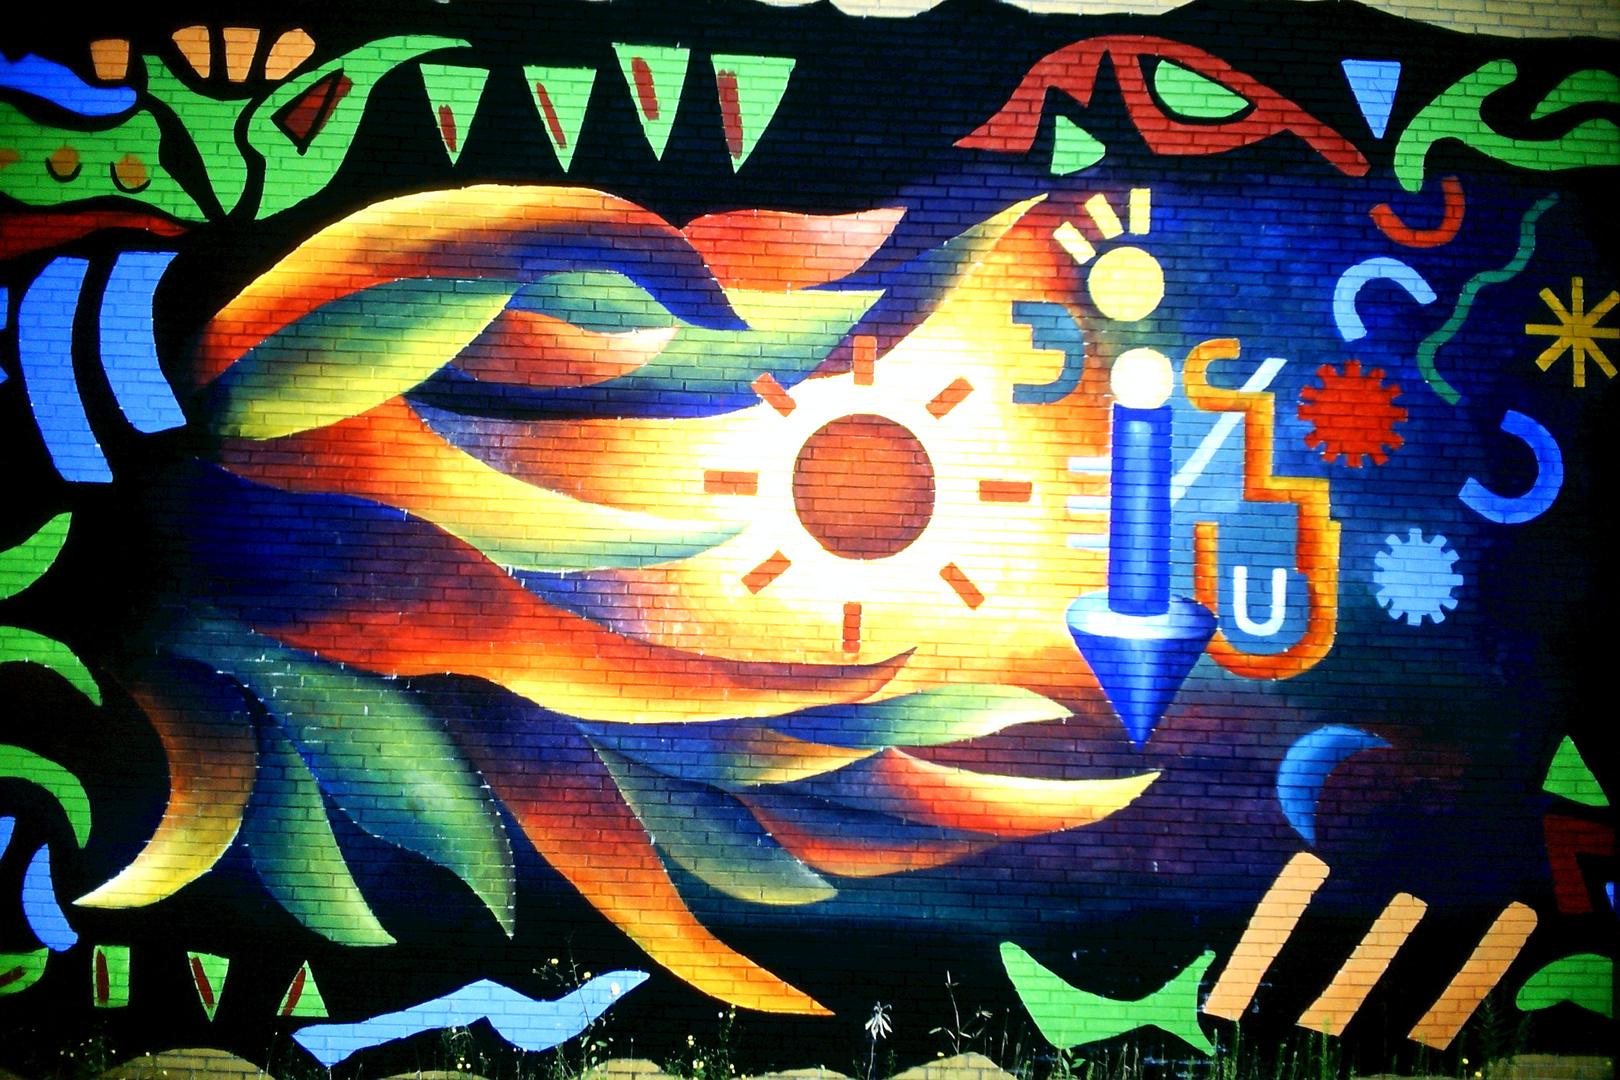 Graffiti an der Uni Straße Bochum.